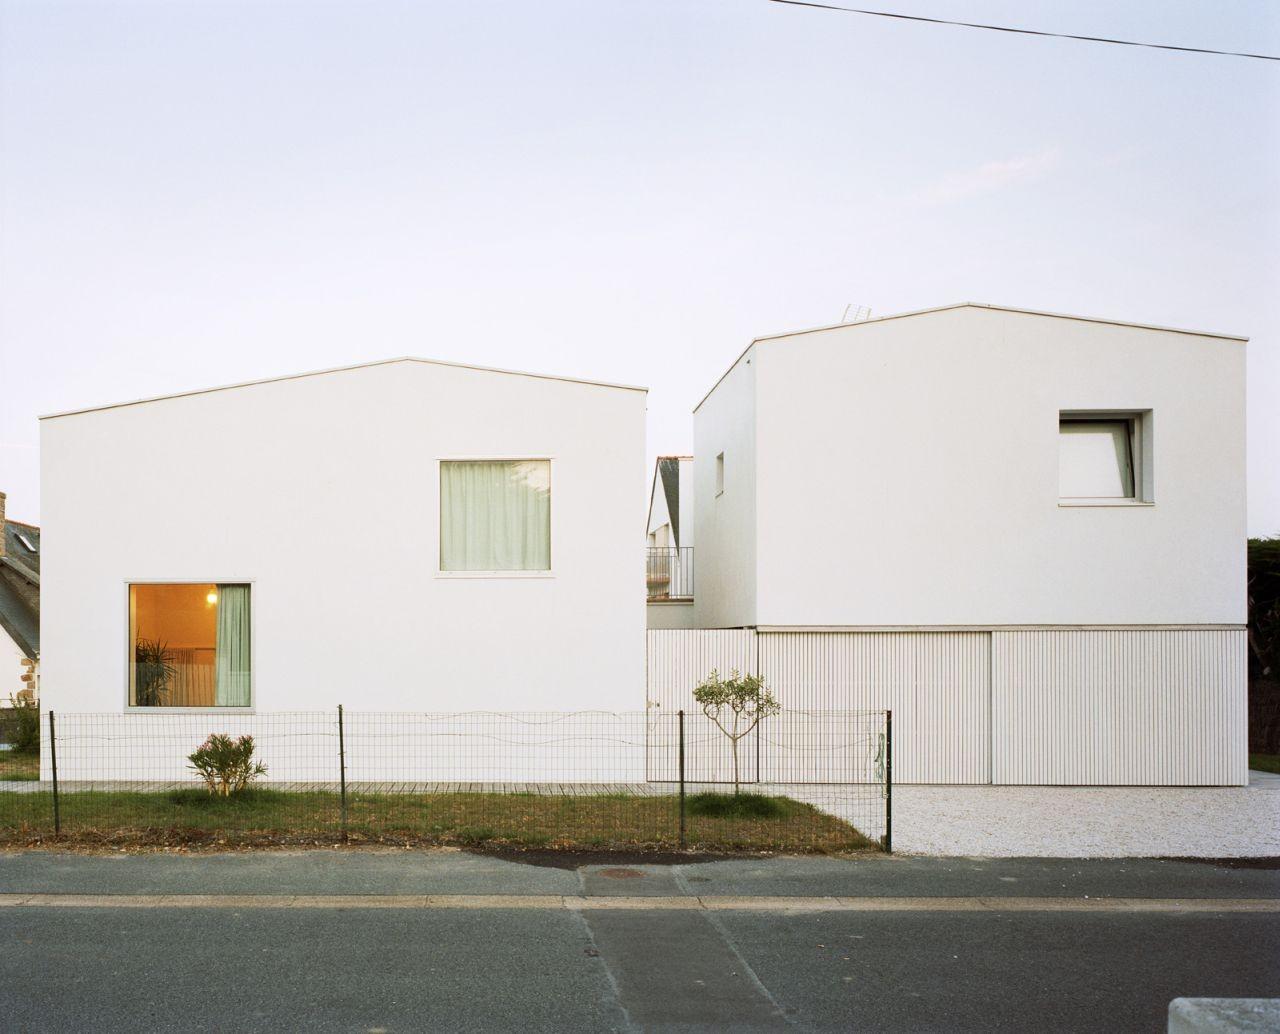 2 Houses & 2 Studios / RAUM, © Audrey Cerdan